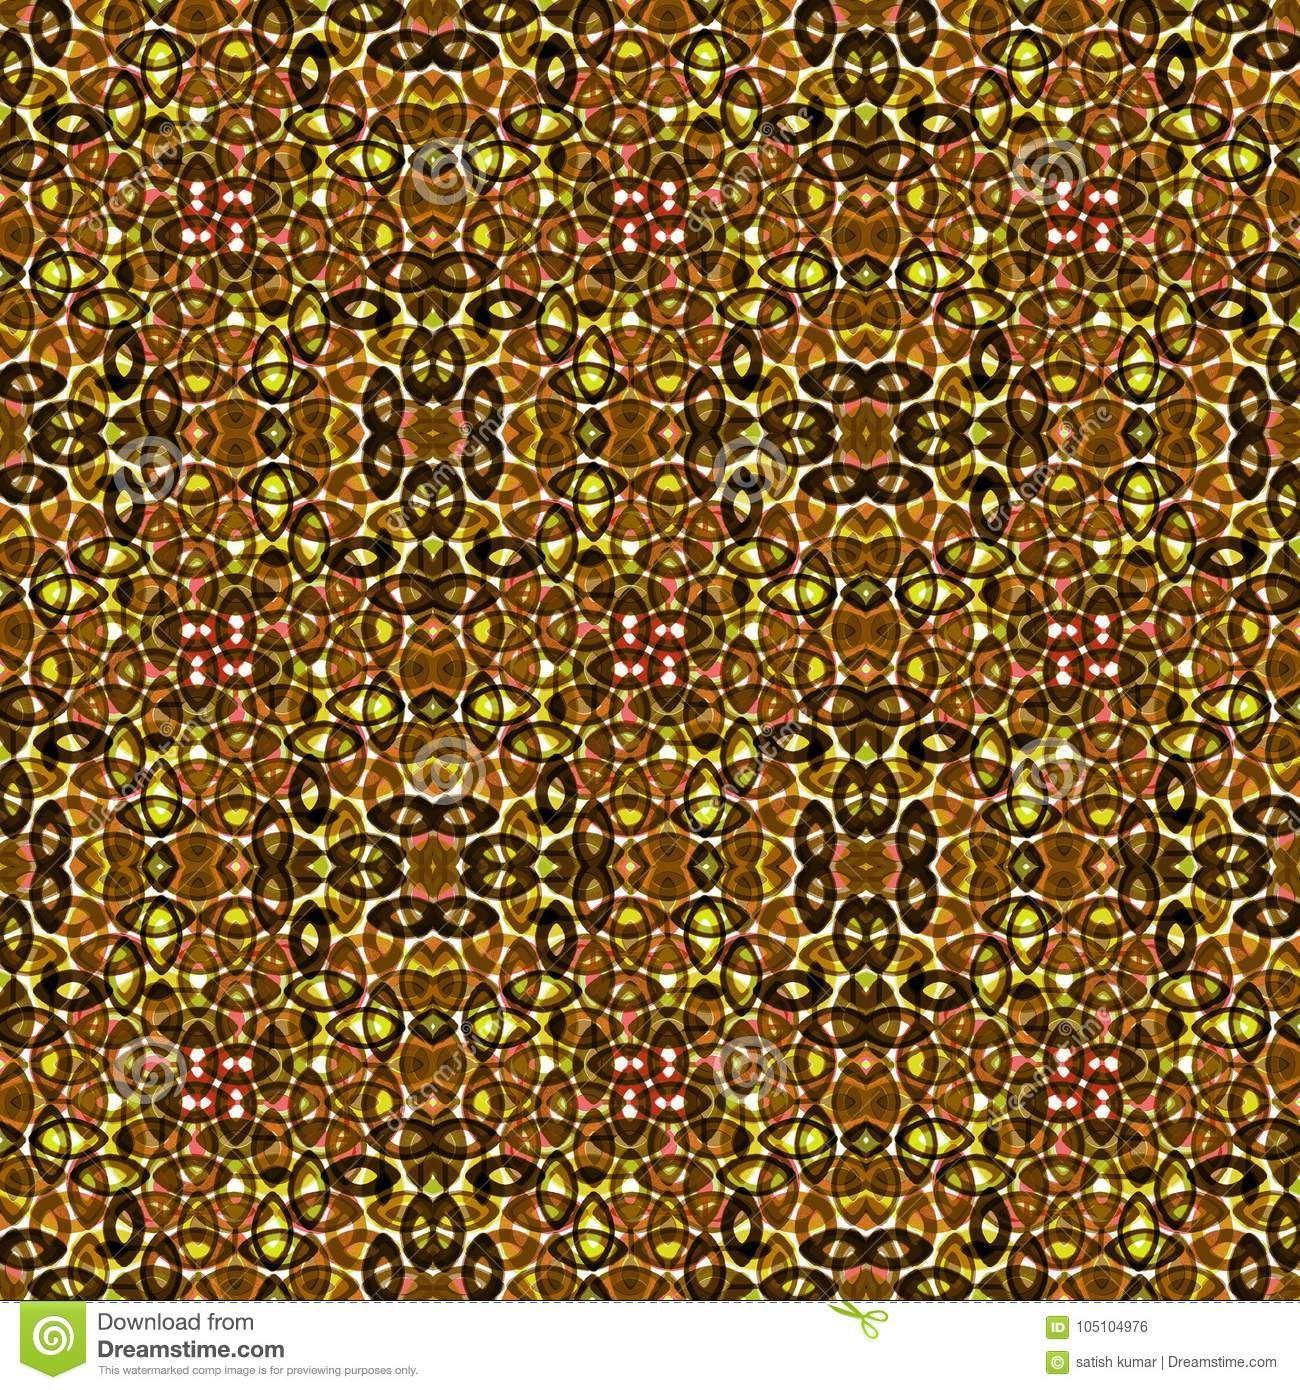 c80d3cb27 Mandala Geometry Tie Dye Texture Repeat Modern Pattern Classic Stock  Illustration - Illustration of background, color: 105104976